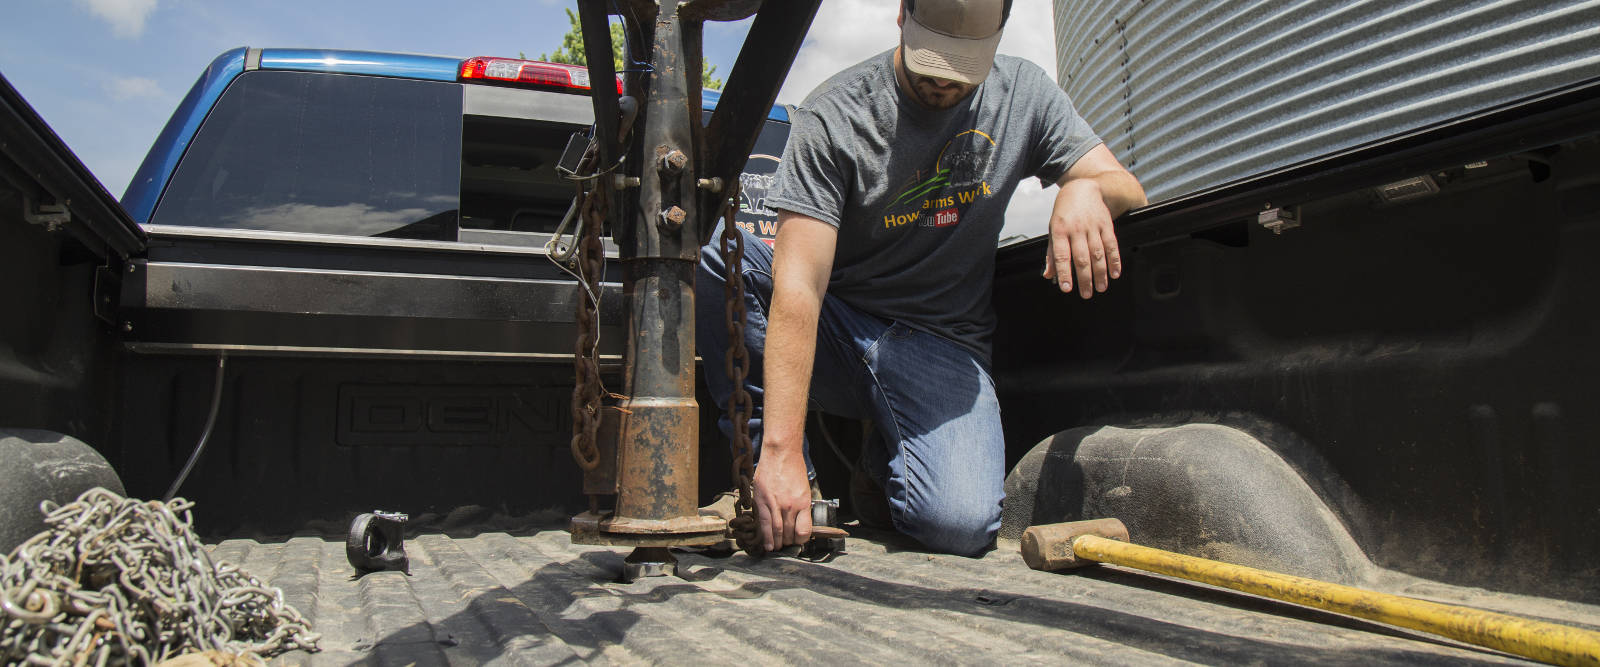 CURT OEM Puck System Gooseneck Hitch Coupled Work Truck